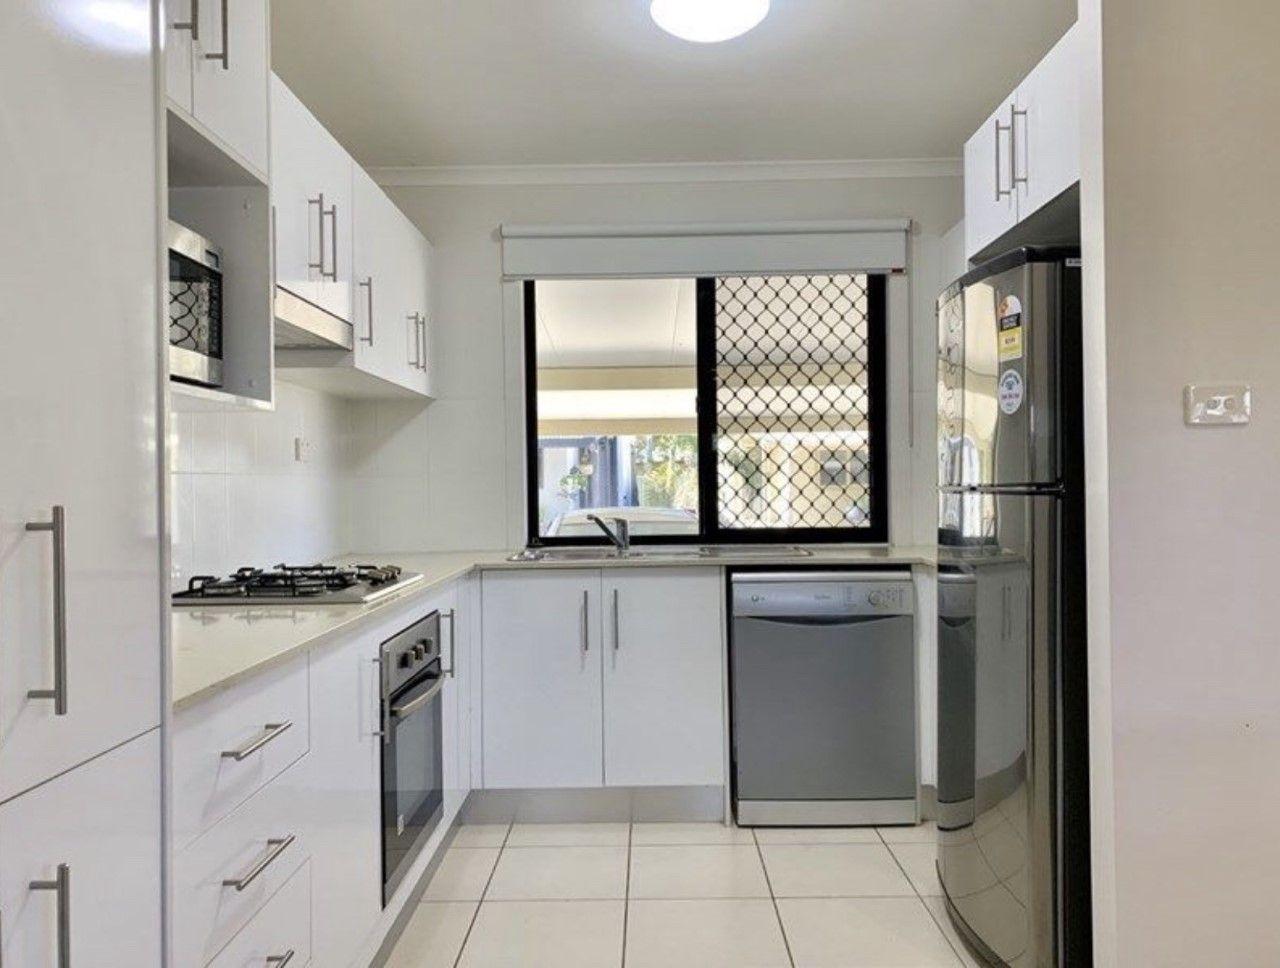 4/5 Atkinson Street, Middlemount QLD 4746, Image 2